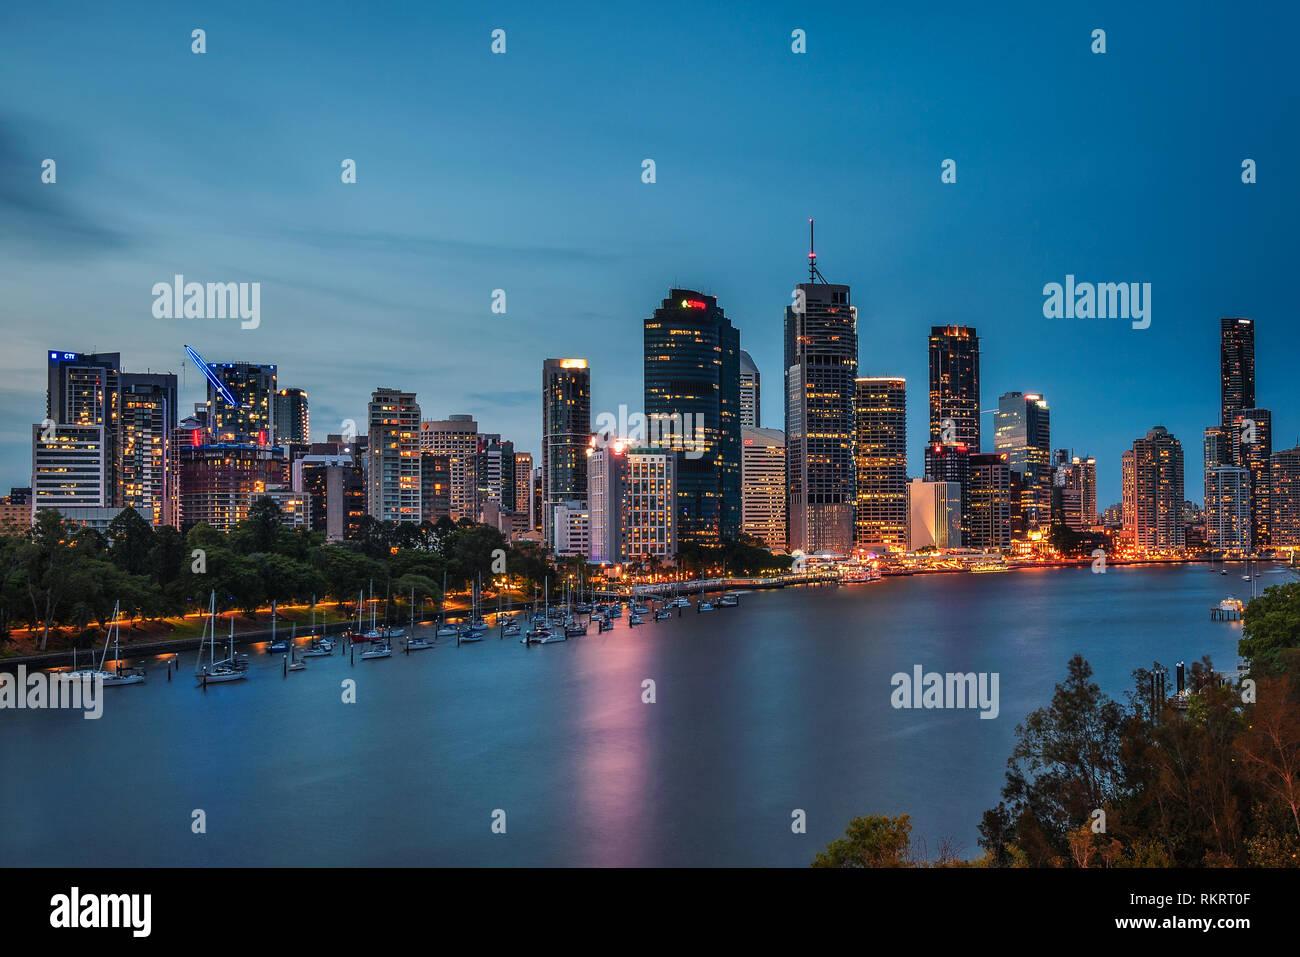 Night skyline of Brisbane city and Brisbane river from Kangaroo Point - Stock Image